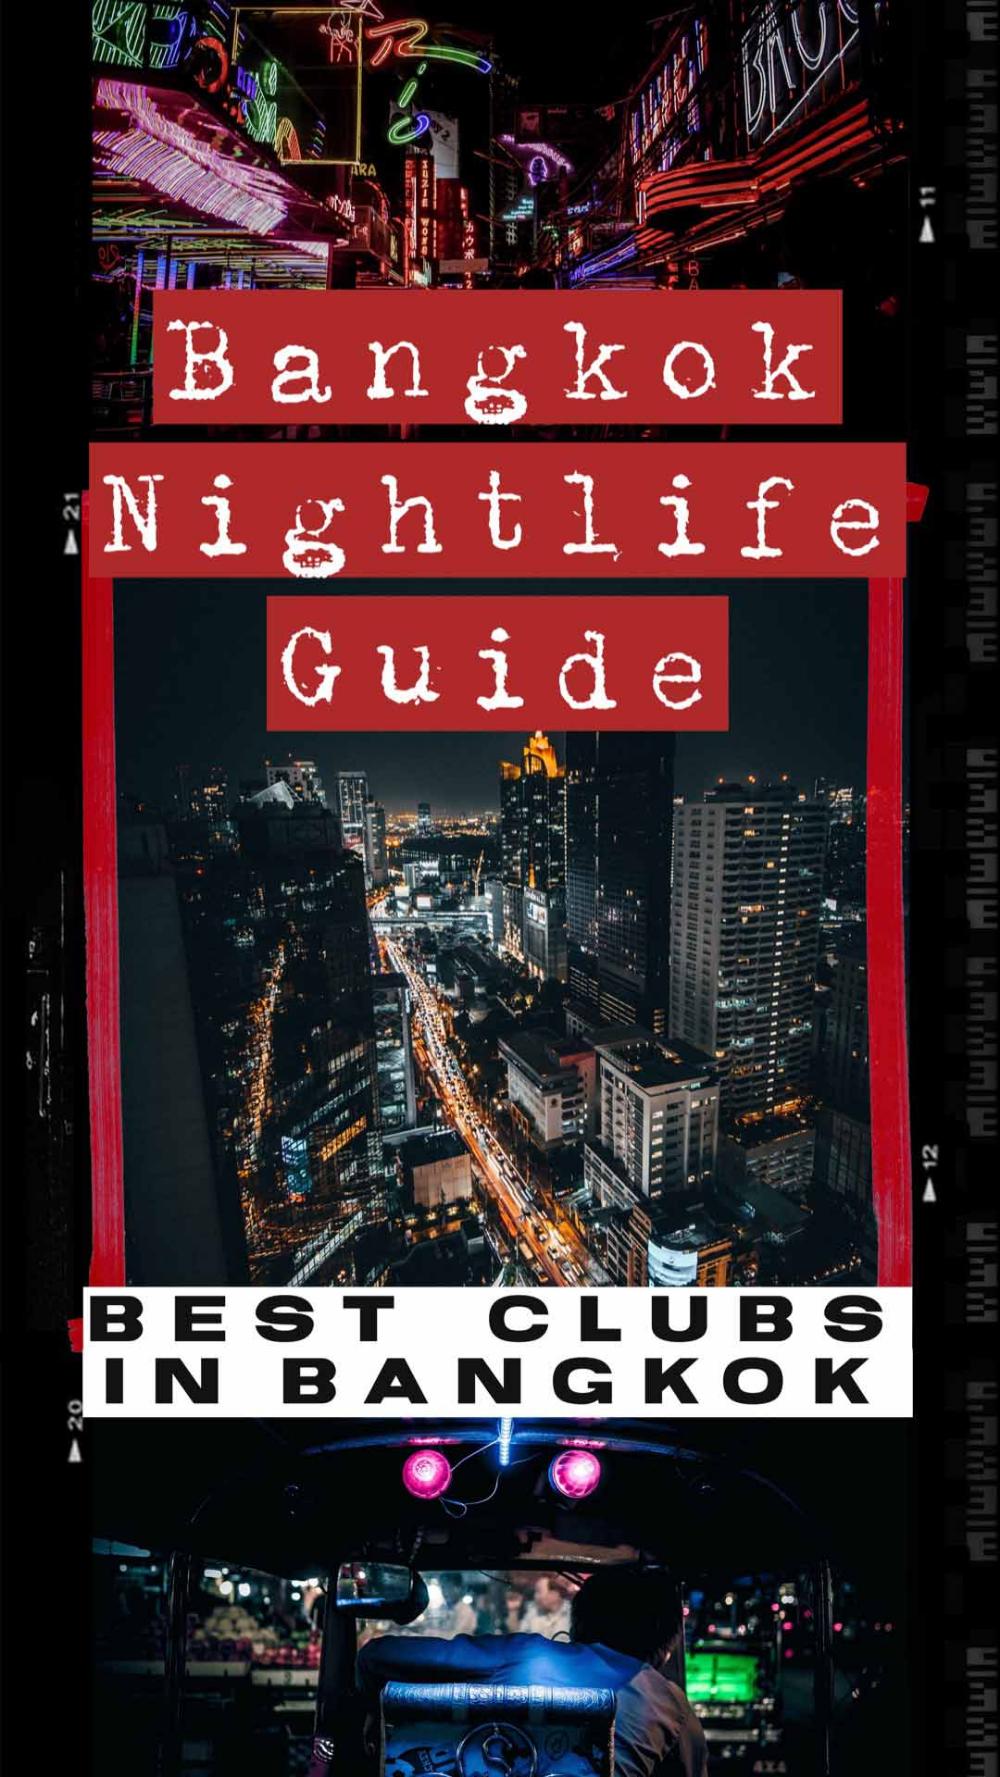 The Best Clubs In Bangkok Thailand Bangkok Nightlife Guide 2019 Bangkok Nightlife Thailand Nightlife Night Life